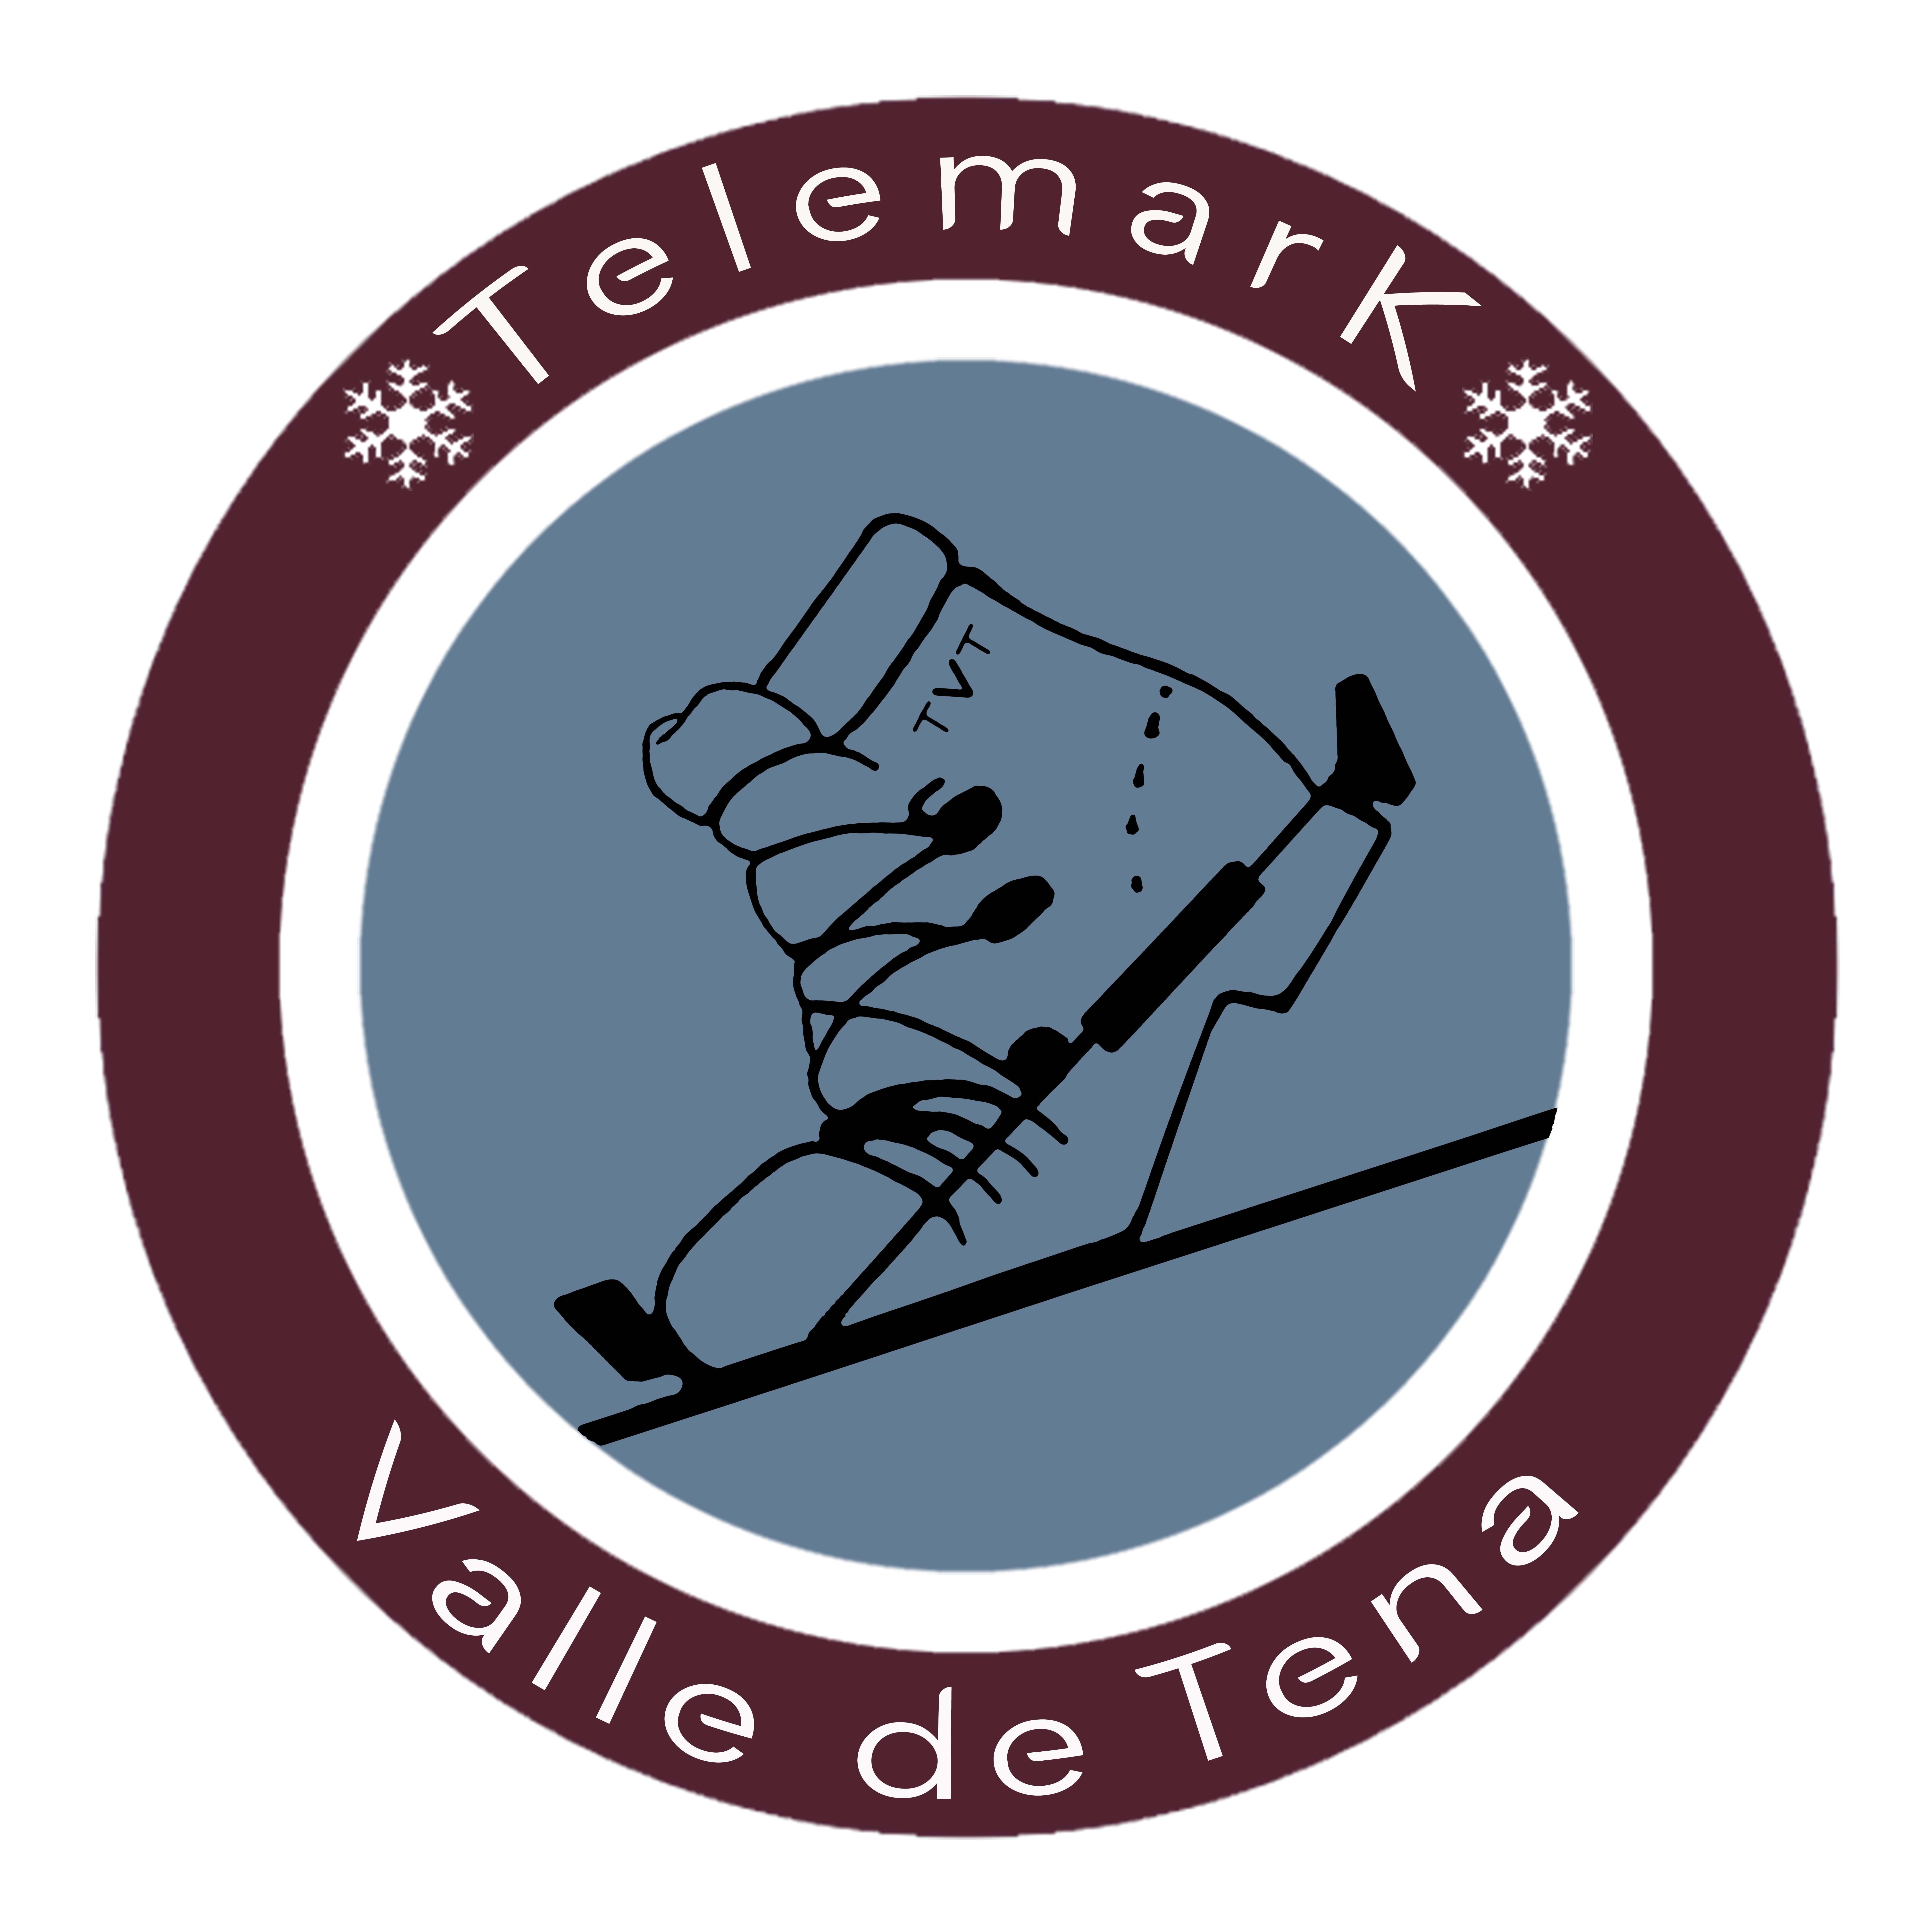 Logo Clara DEF medel gira r